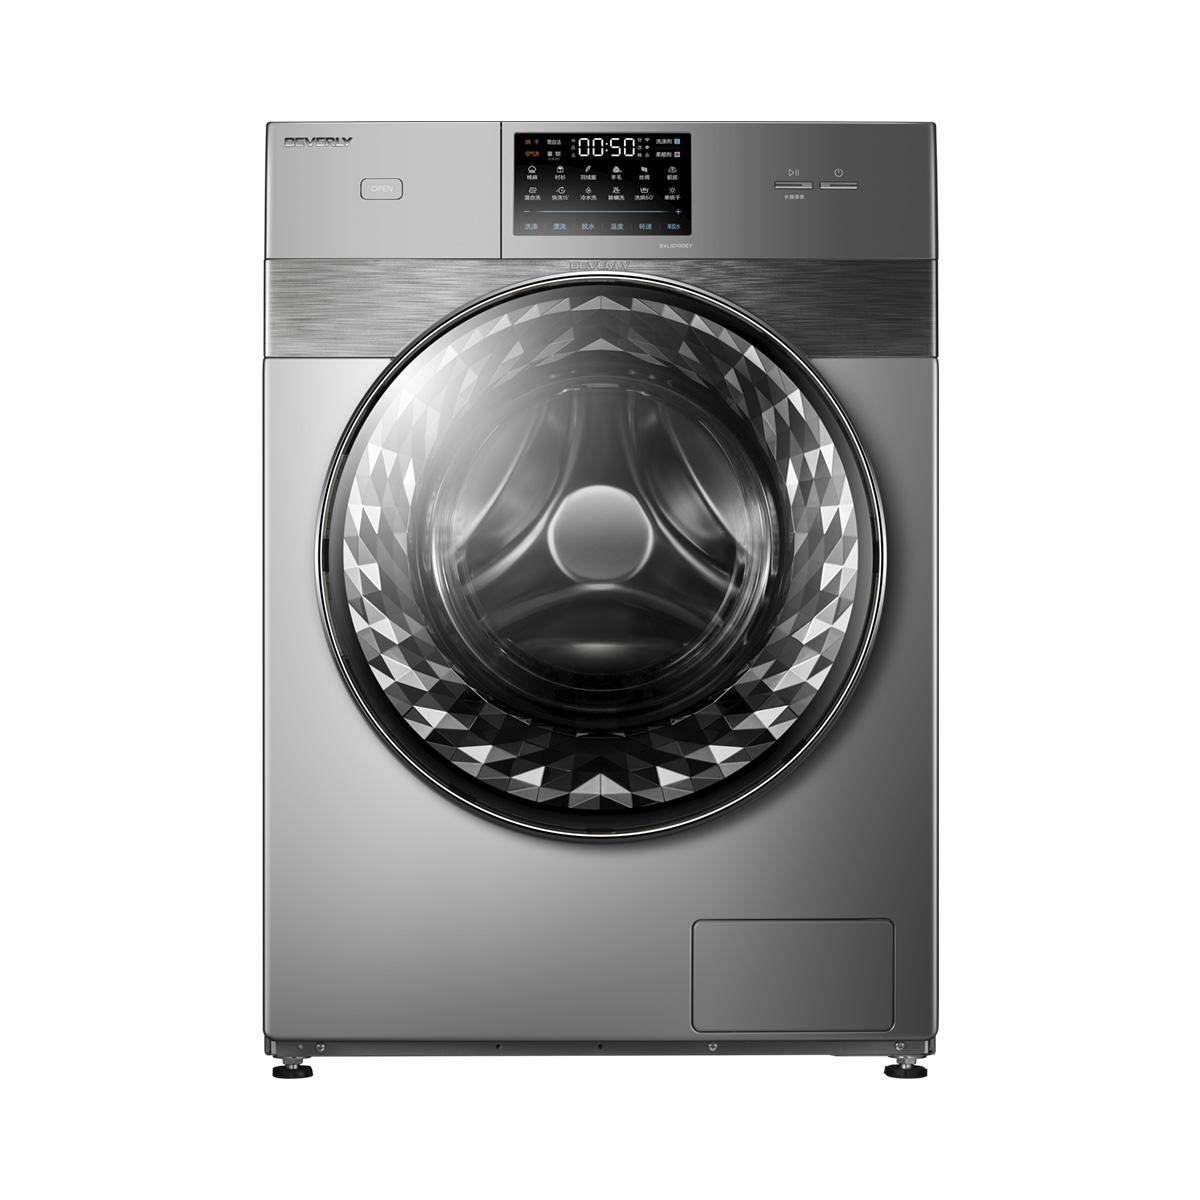 BEVERLY/比佛利 BVL1D100EY洗衣机 说明书.pdf